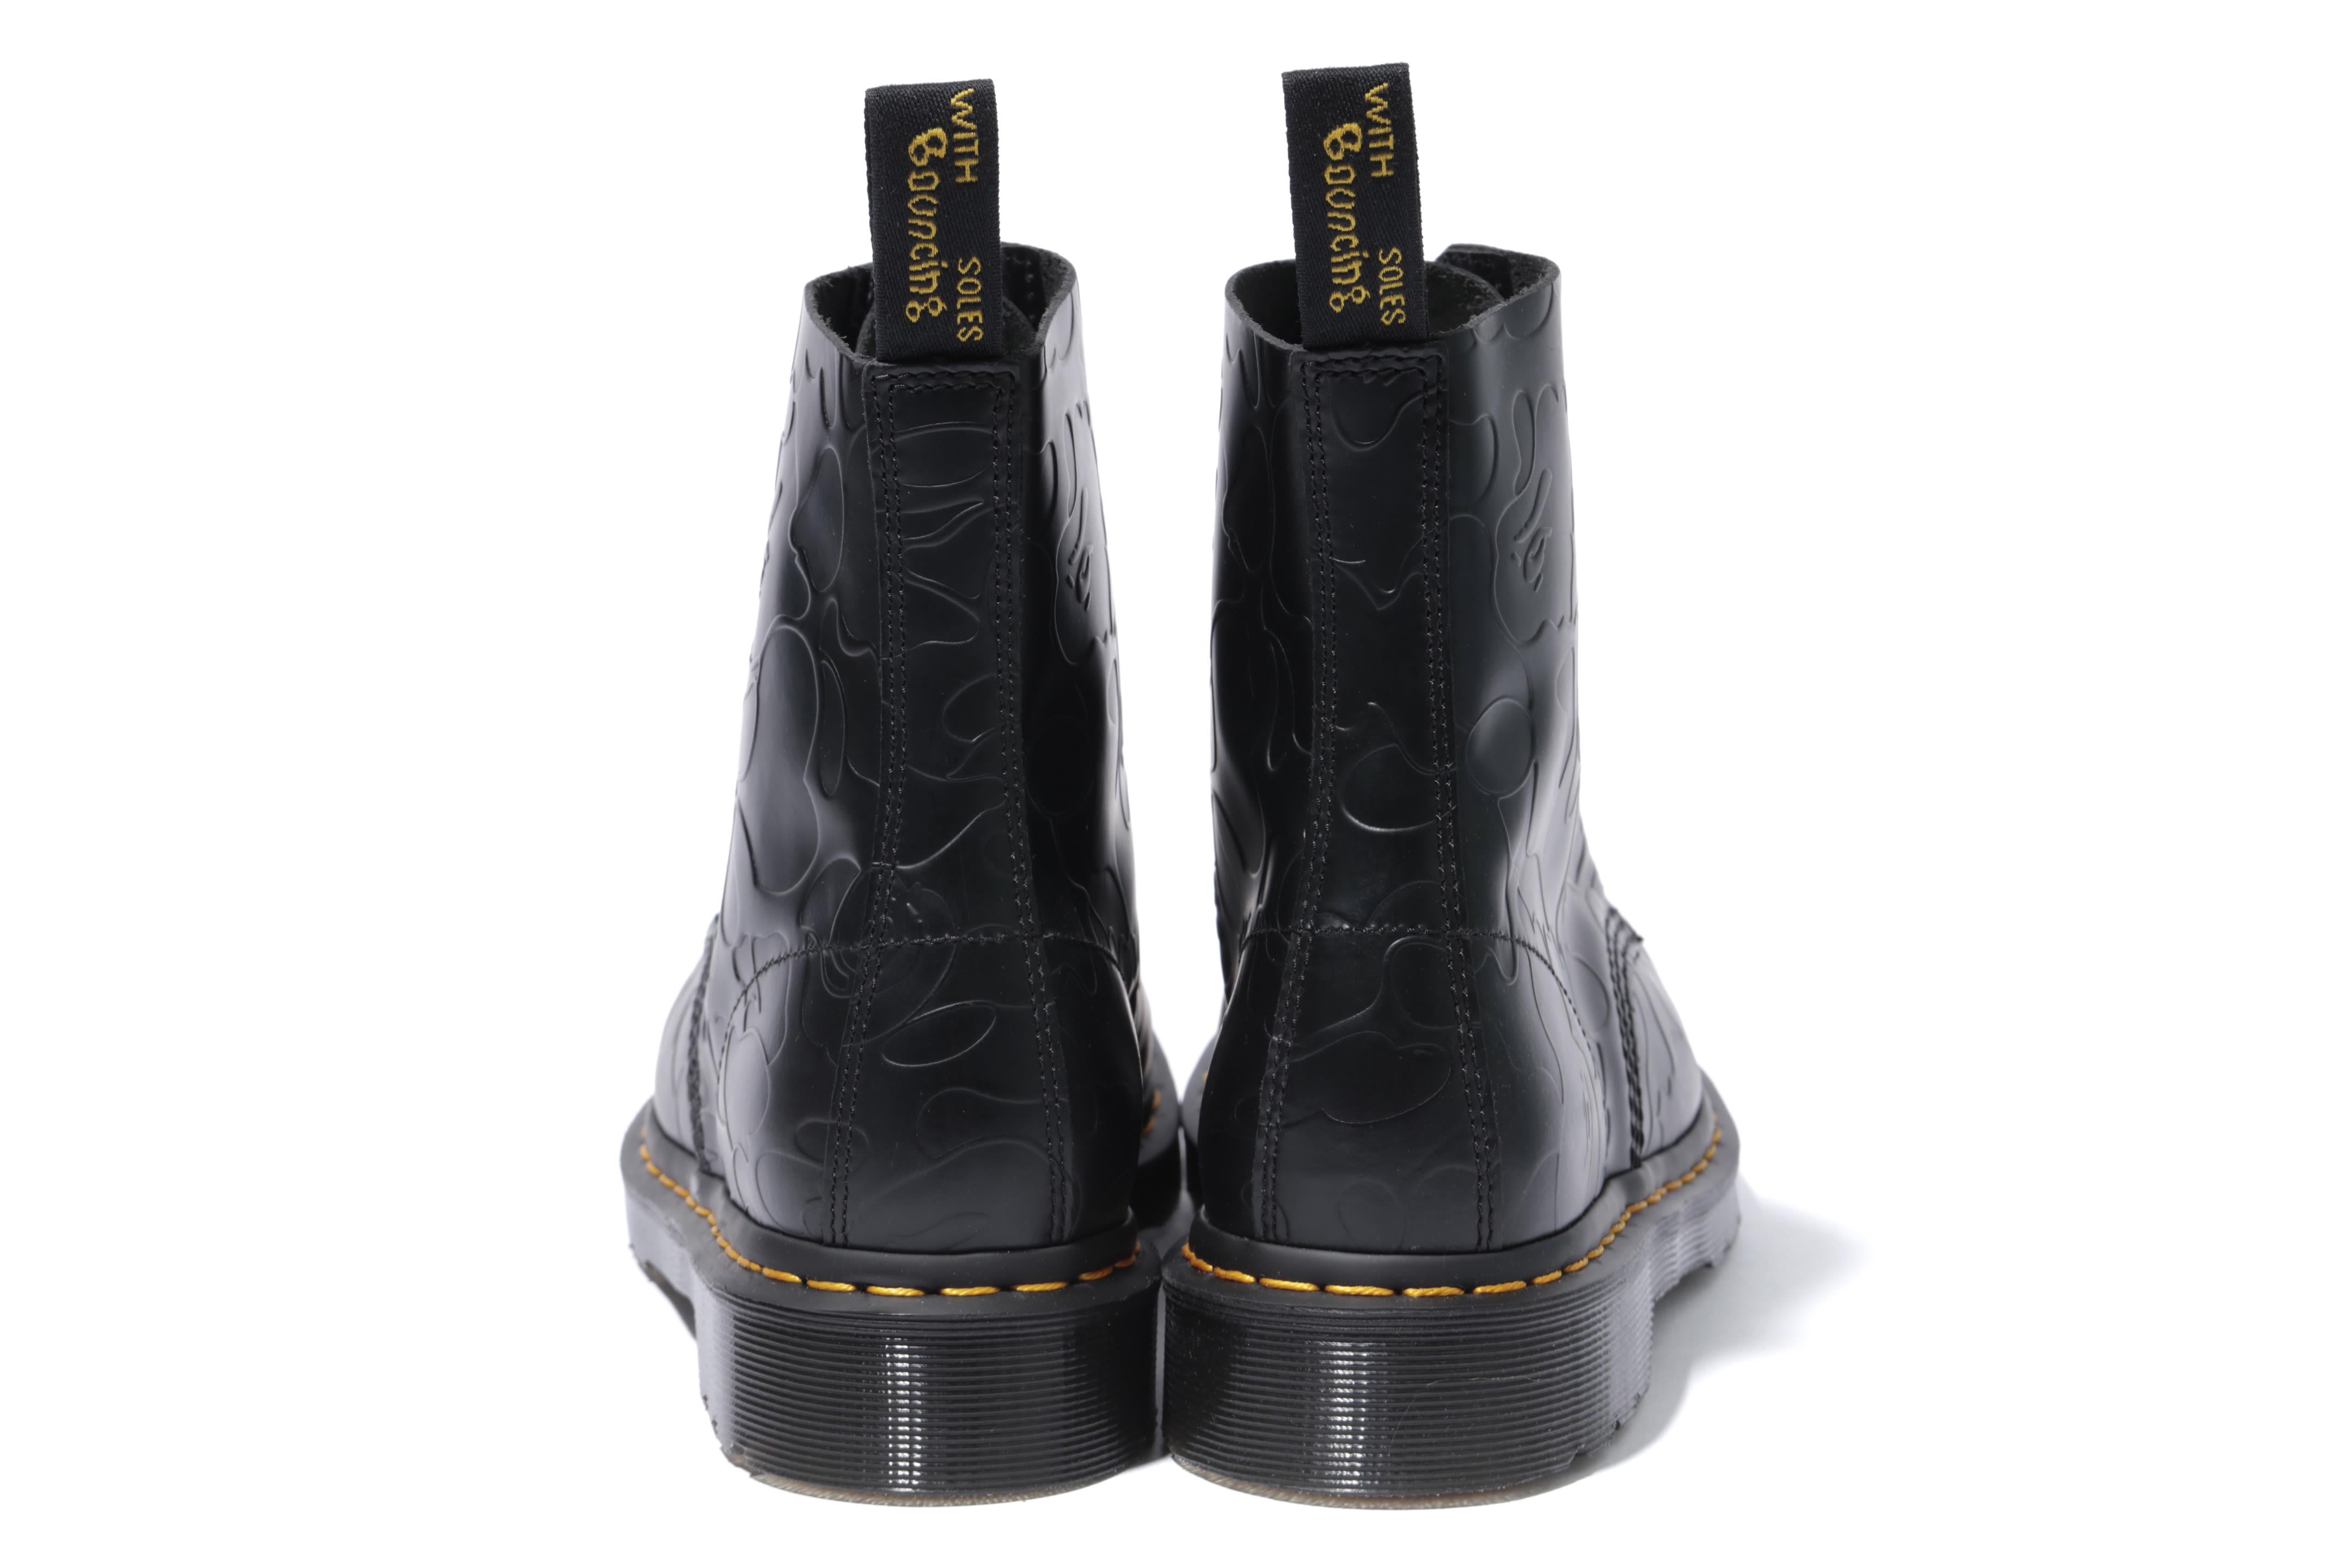 Bape x Dr. Martens 1460 'Black' (Heel)